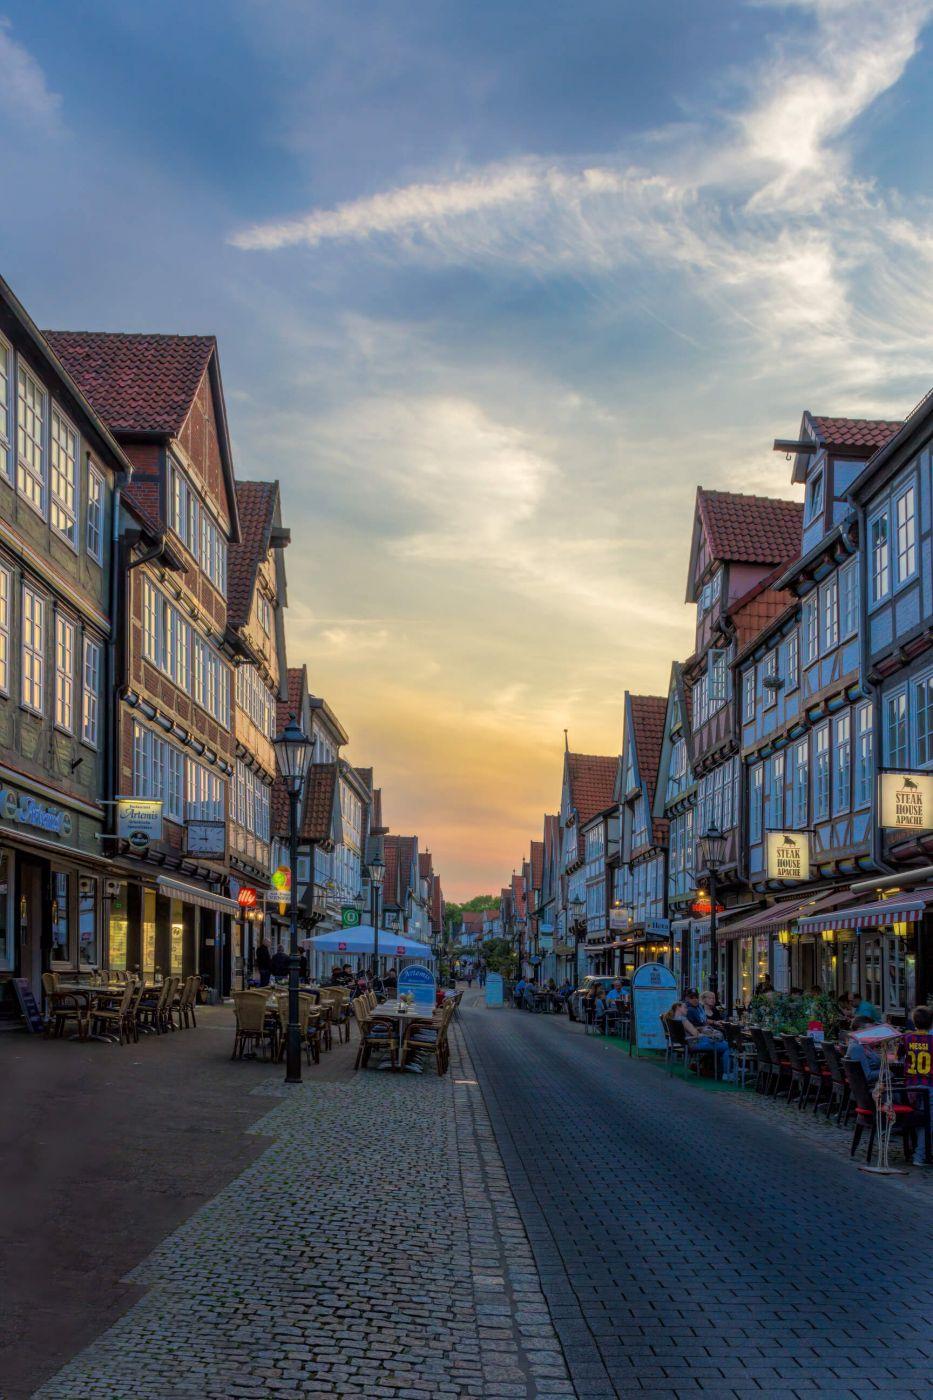 Mauernstrasse, Celle, Germany